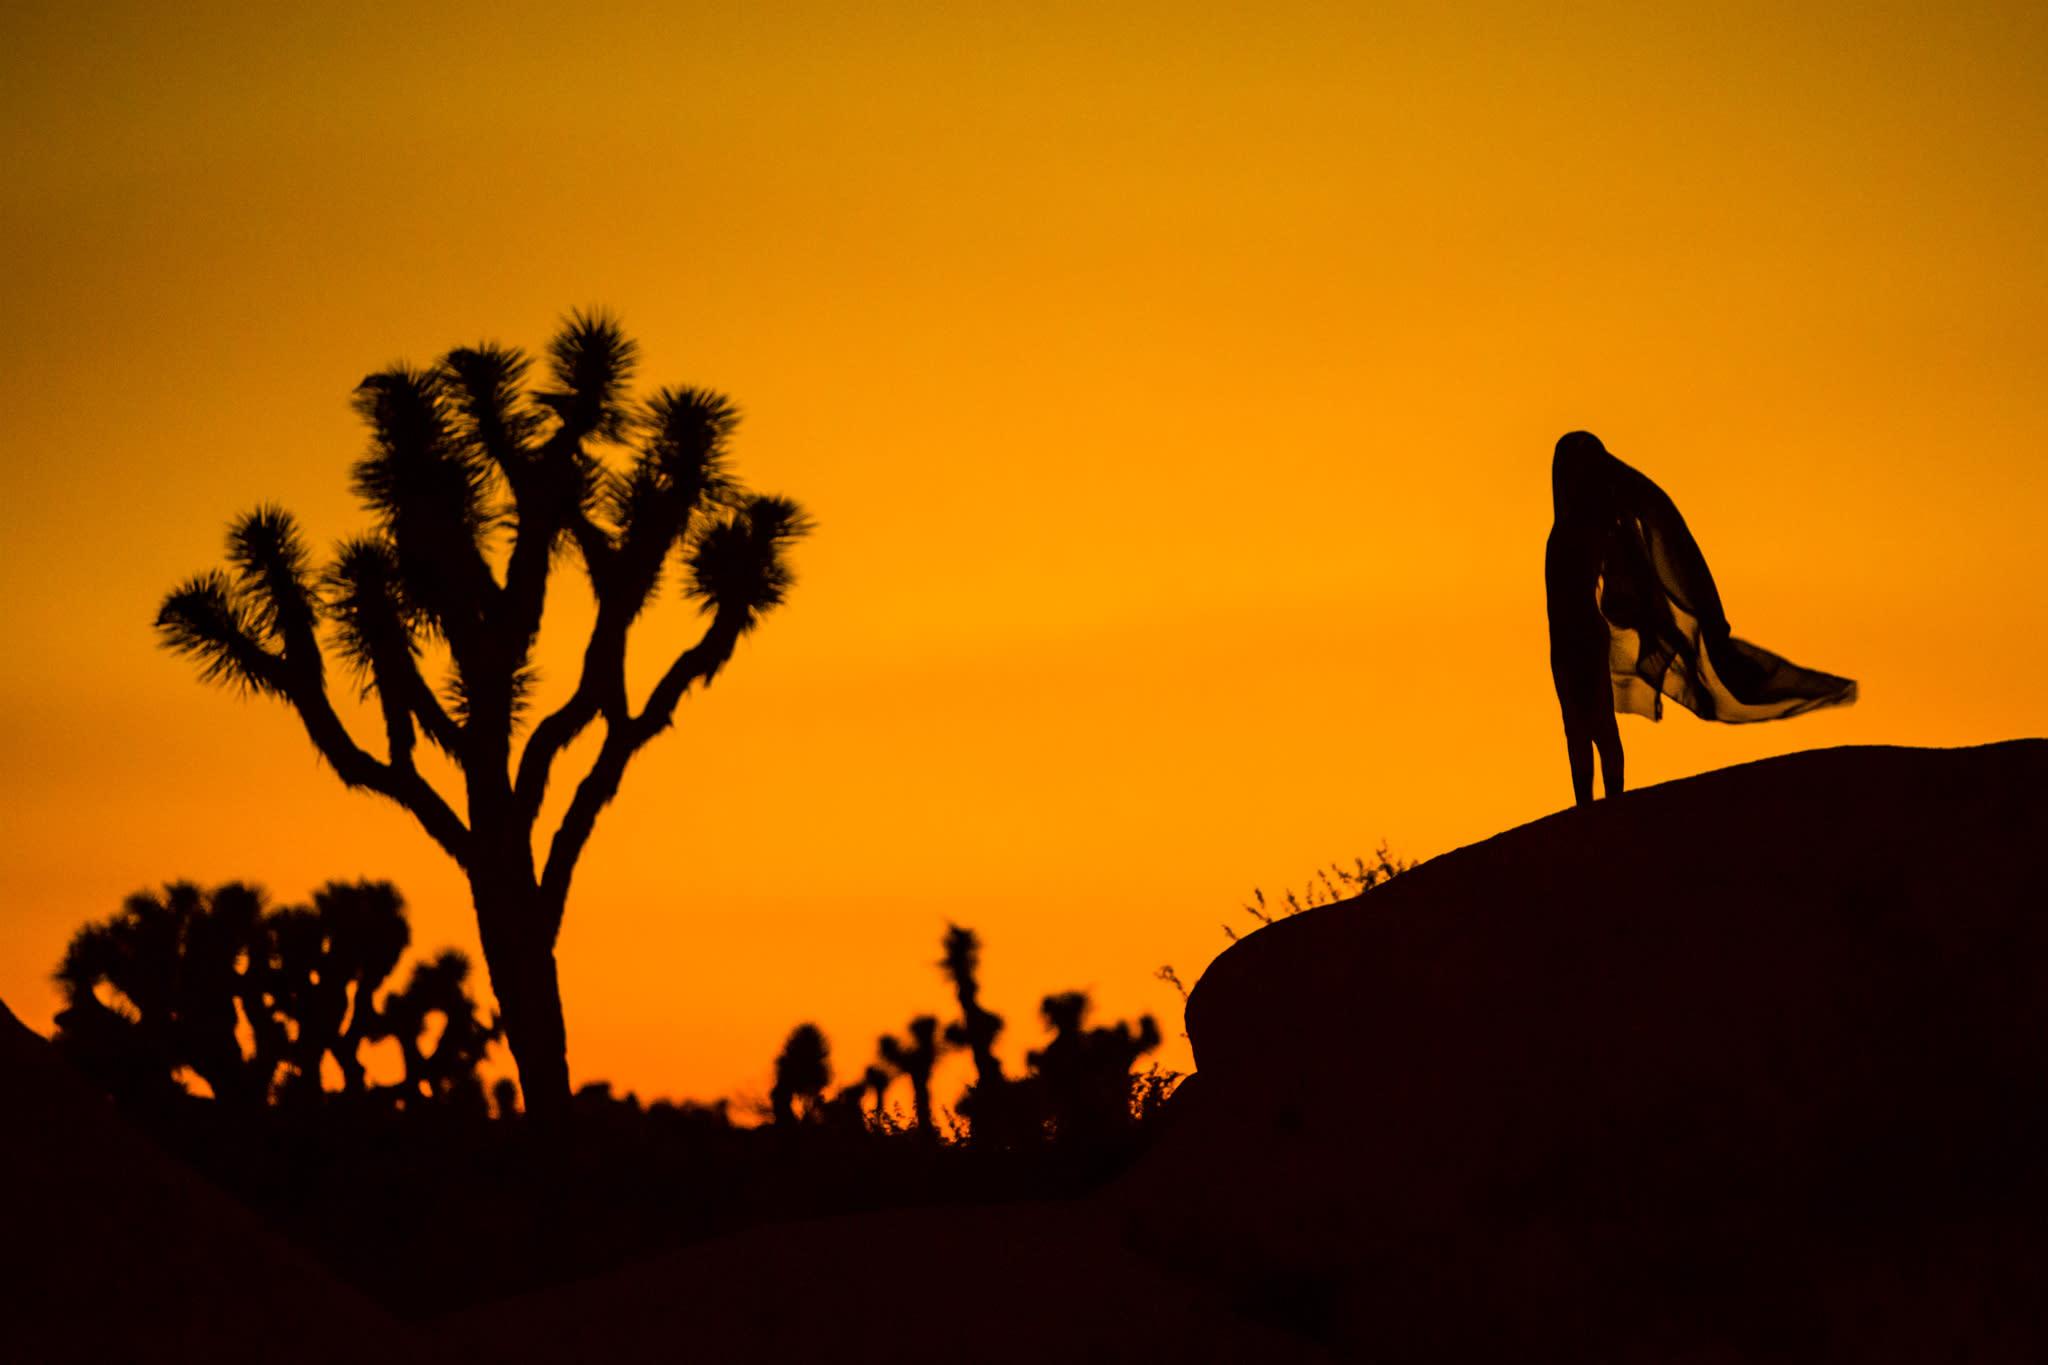 11 clayton woodley ydesert silhouette shot in joshua tree jwcqwq